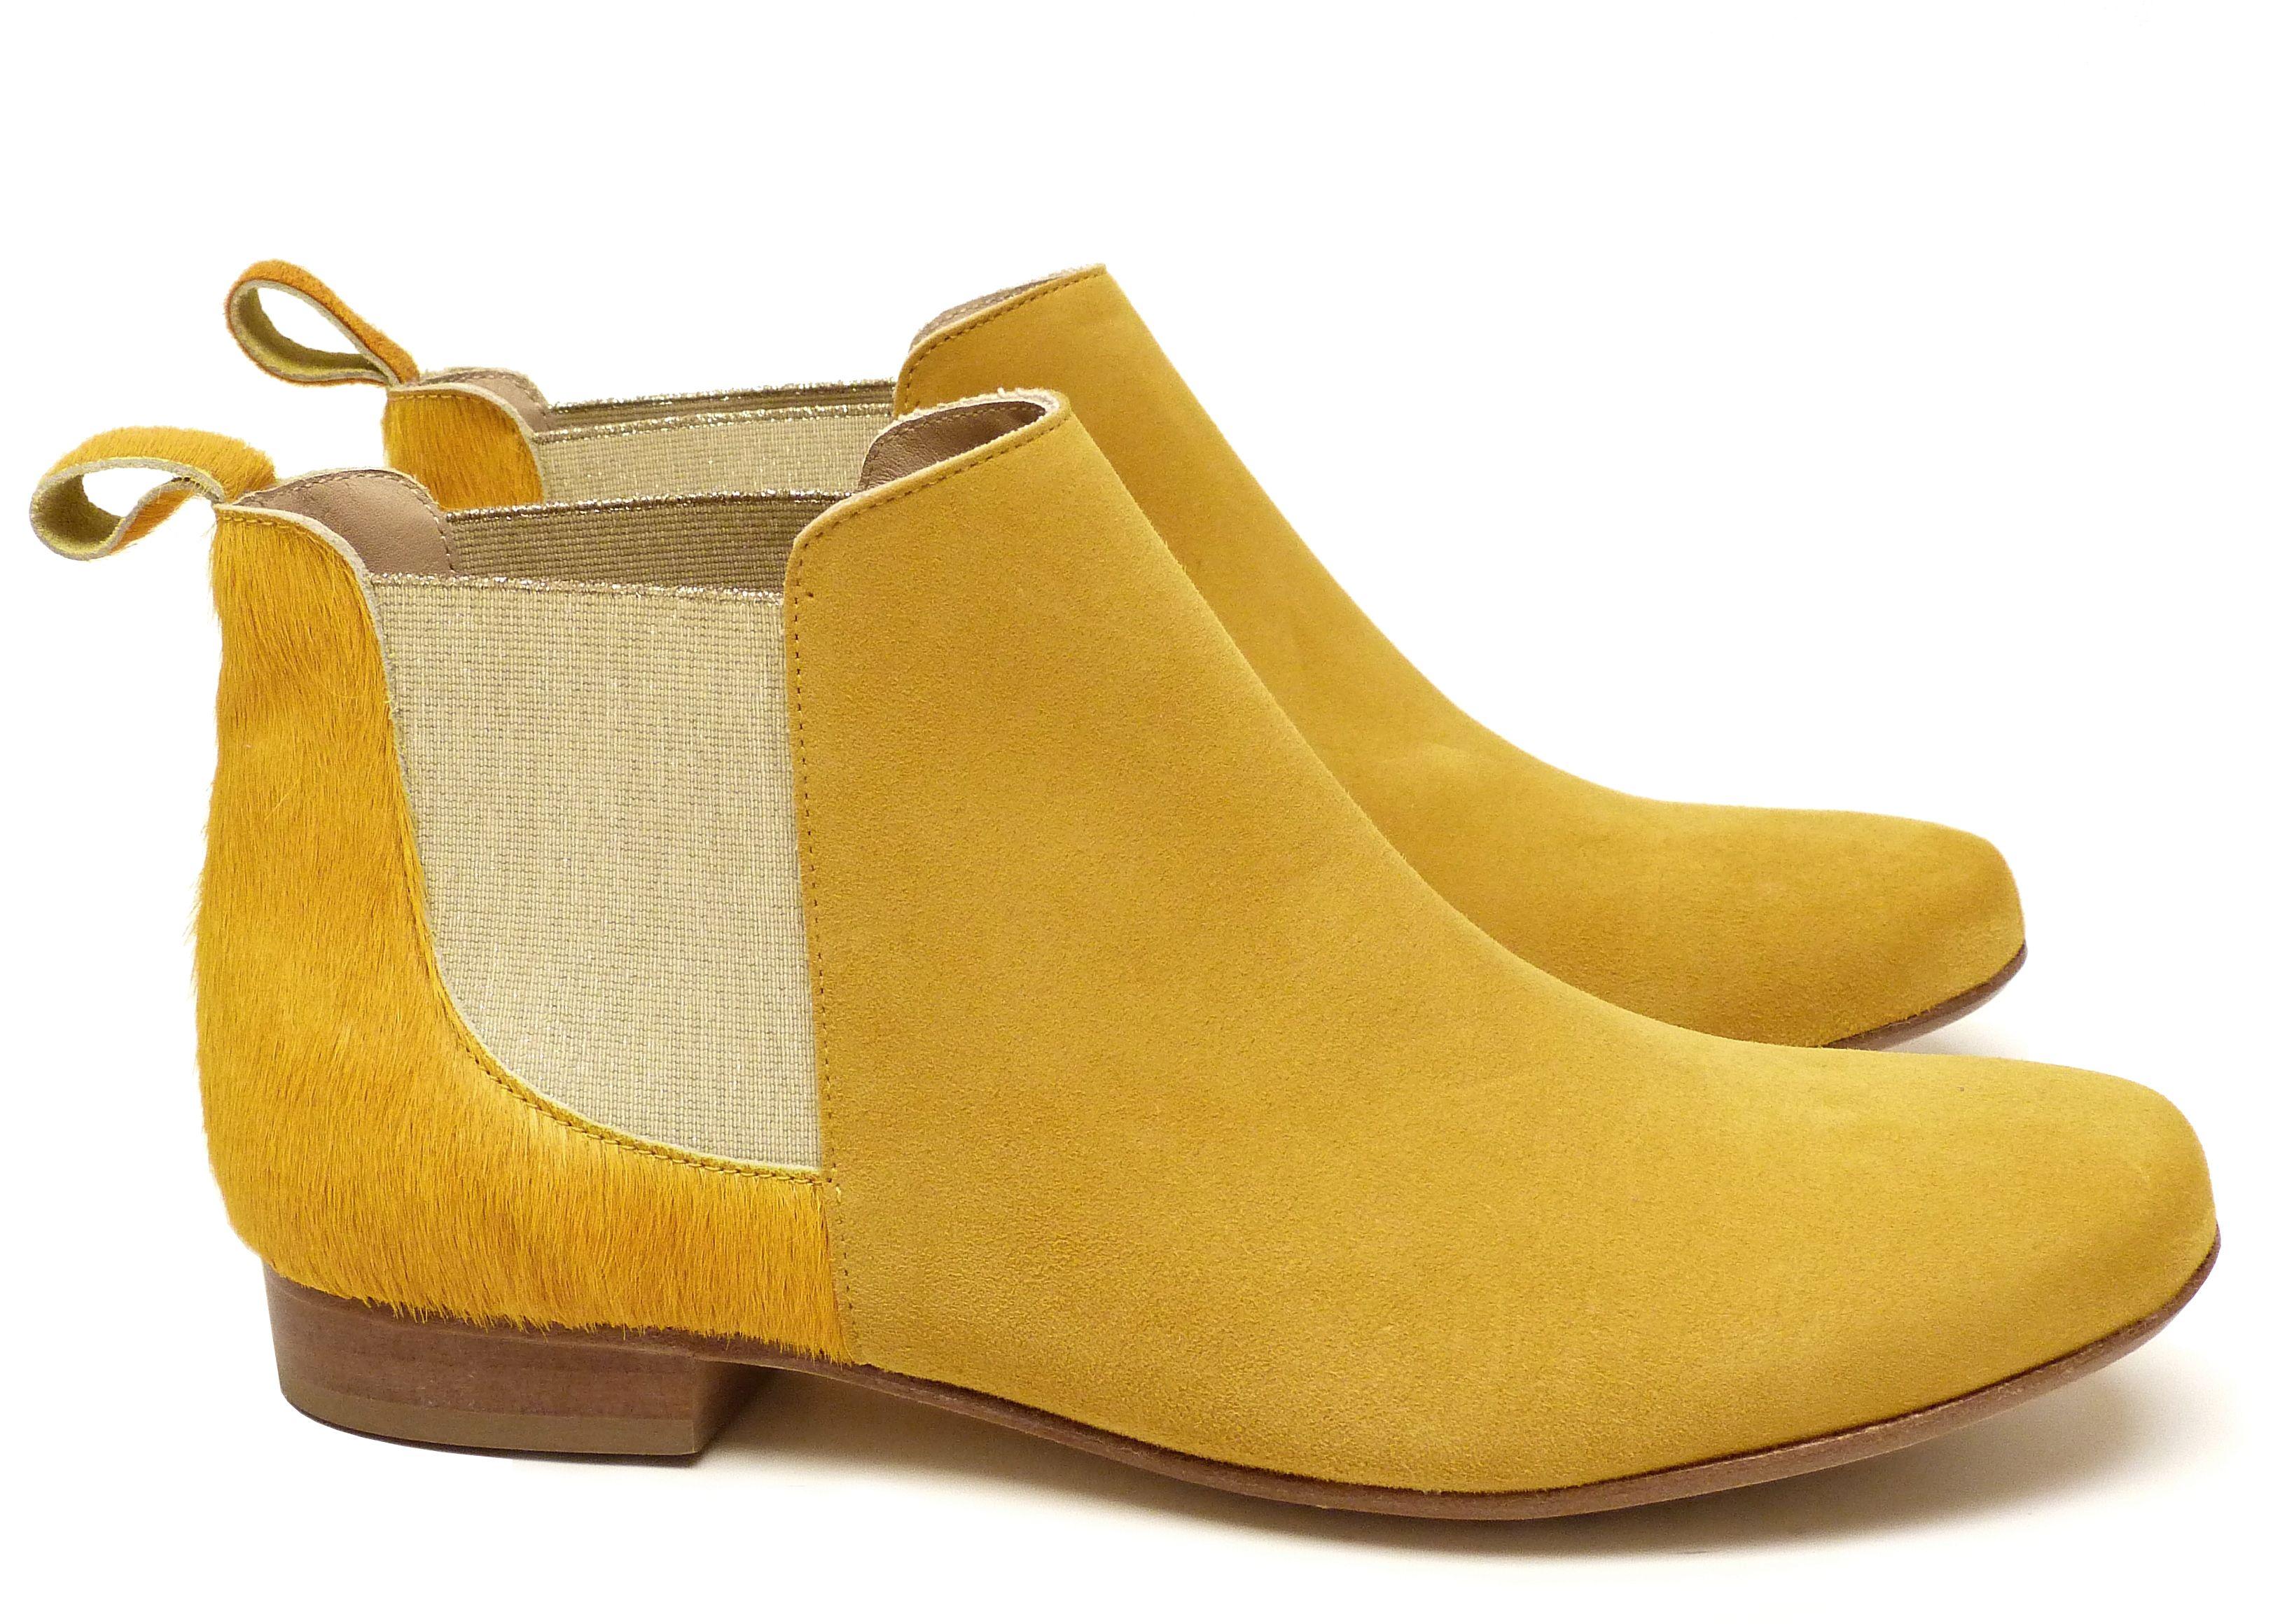 Chaussure Femme Boots Printemps Ete 2015 Maurice Manufacture BRICE cuir à  poil ras jaune soleil -